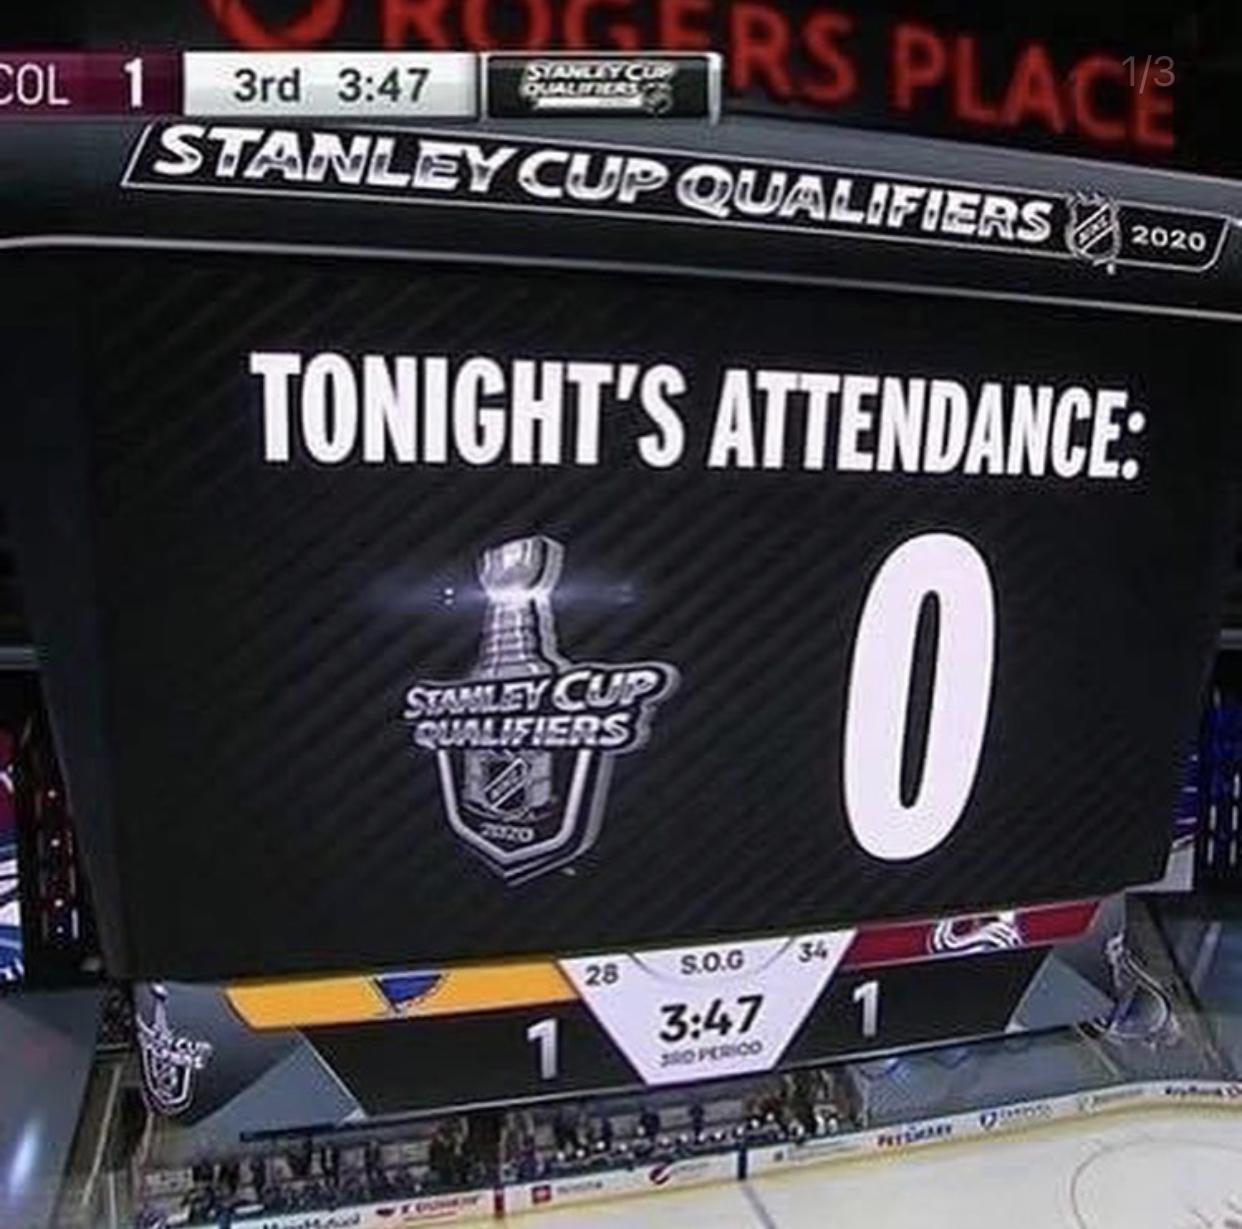 Record breaking attendance figures 😉